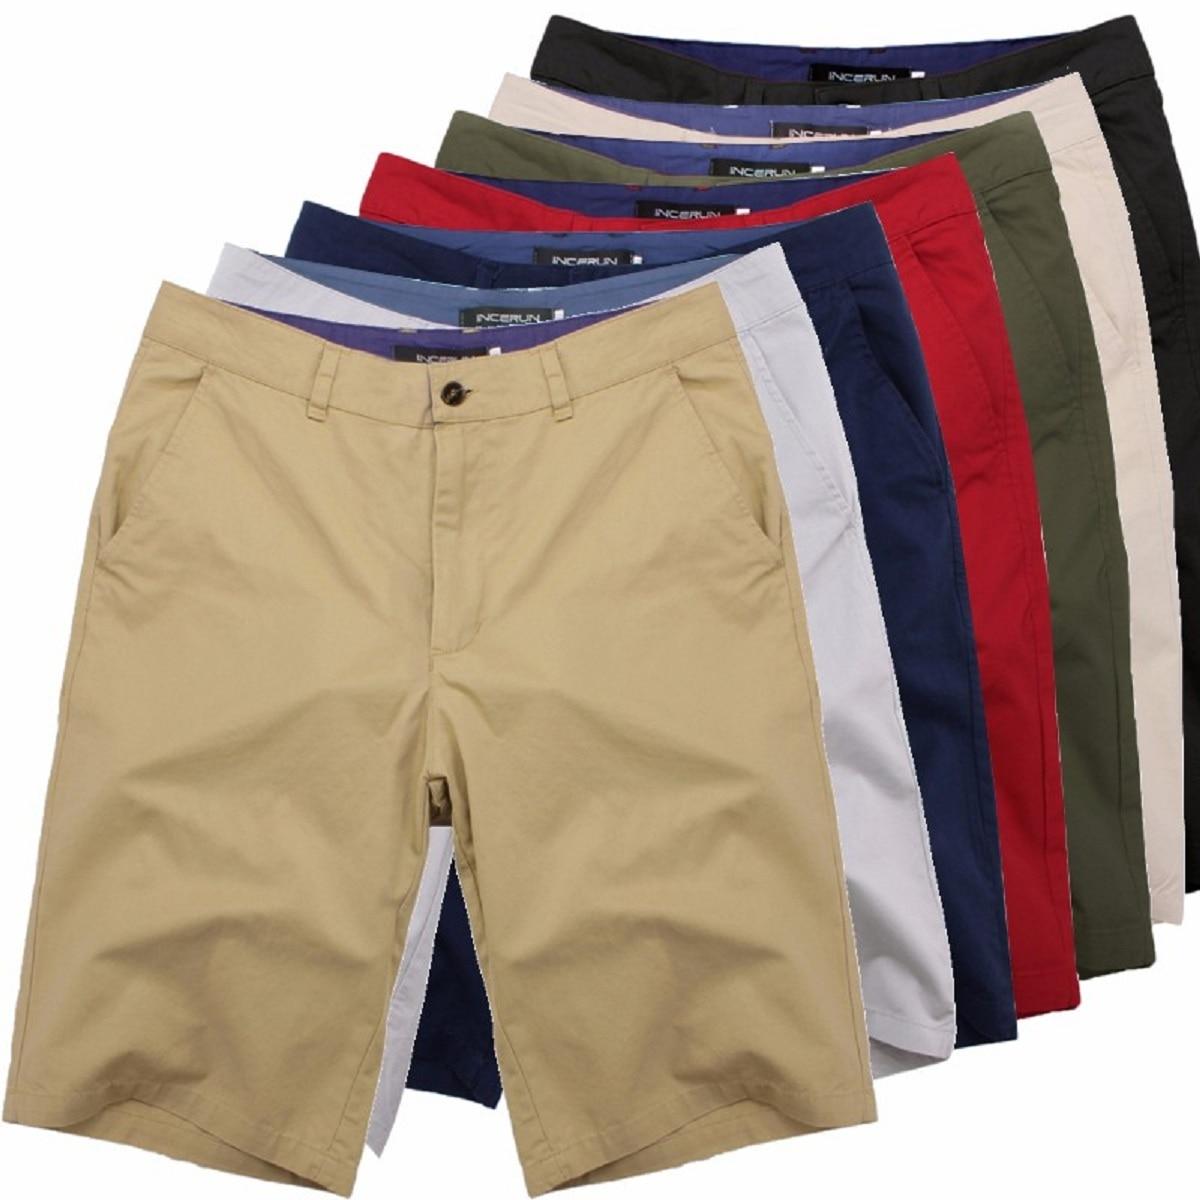 2019 Casual Sommer Shorts Männer Baumwolle Knie Länge chinos shorts Vintage Casual Männer Shorts Mode masculina Big Große Größe 44